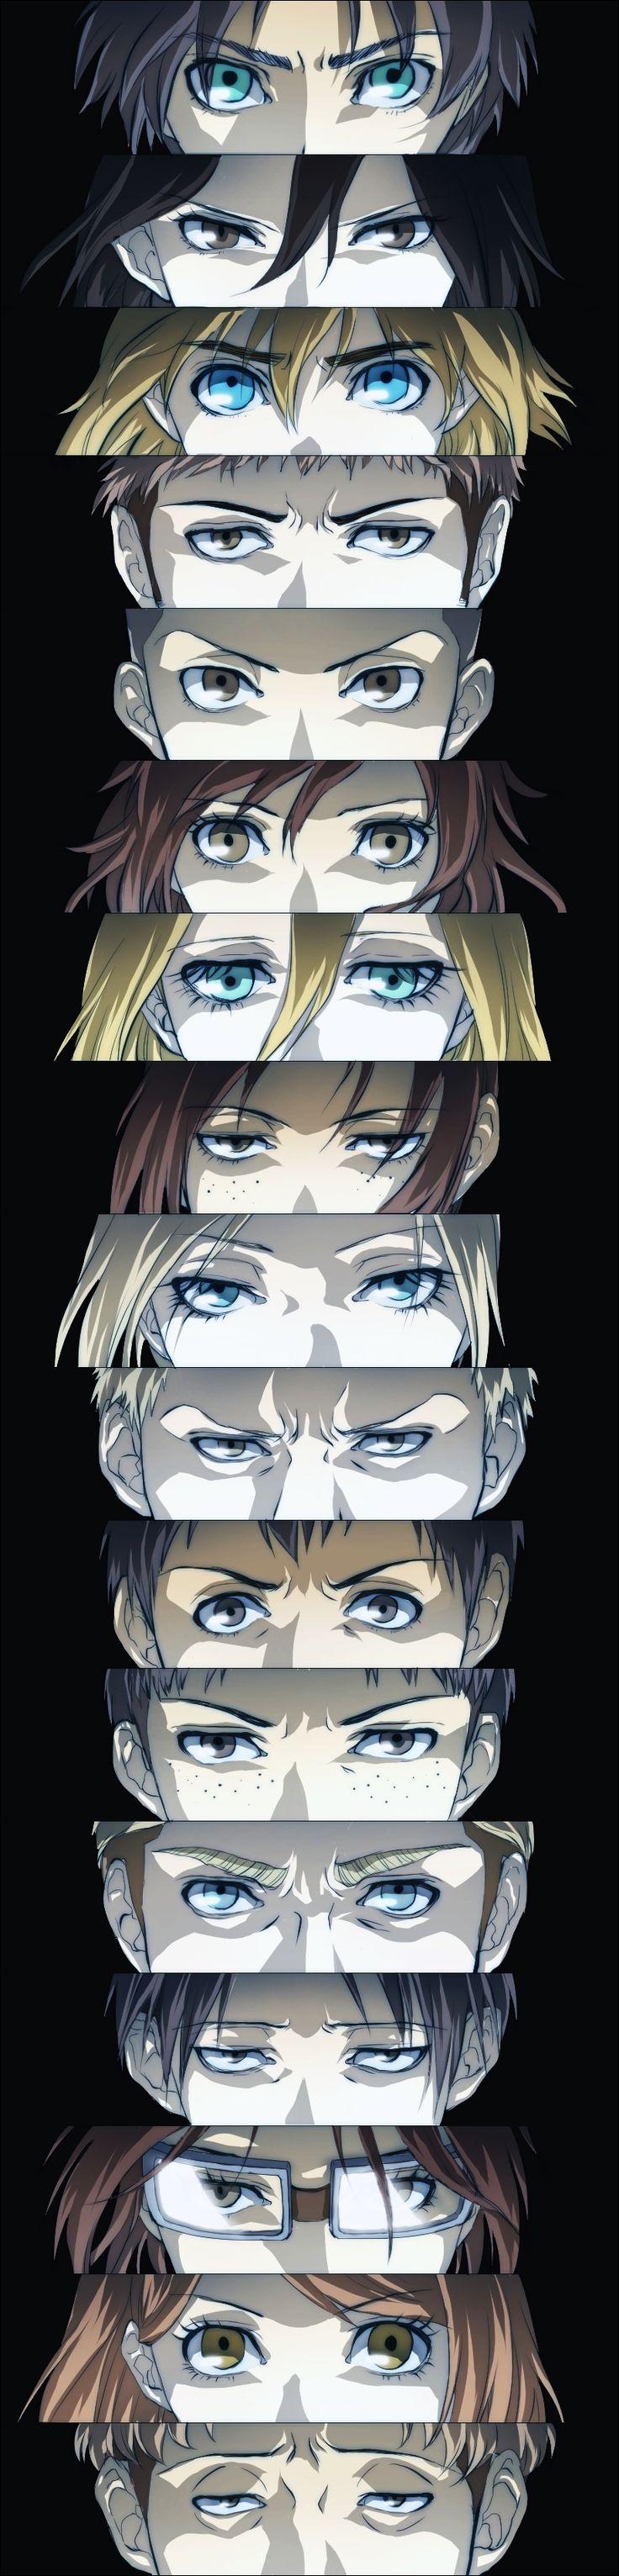 Shingeki no Kyojin - Jean, Marco, Connie, Eren, Armin, Reiner, Bertholdt, Sasha, Levi, Erwin, Auruo, Christa, Hanji, Petra, Ymir, Mikasa and Annie - Eyers